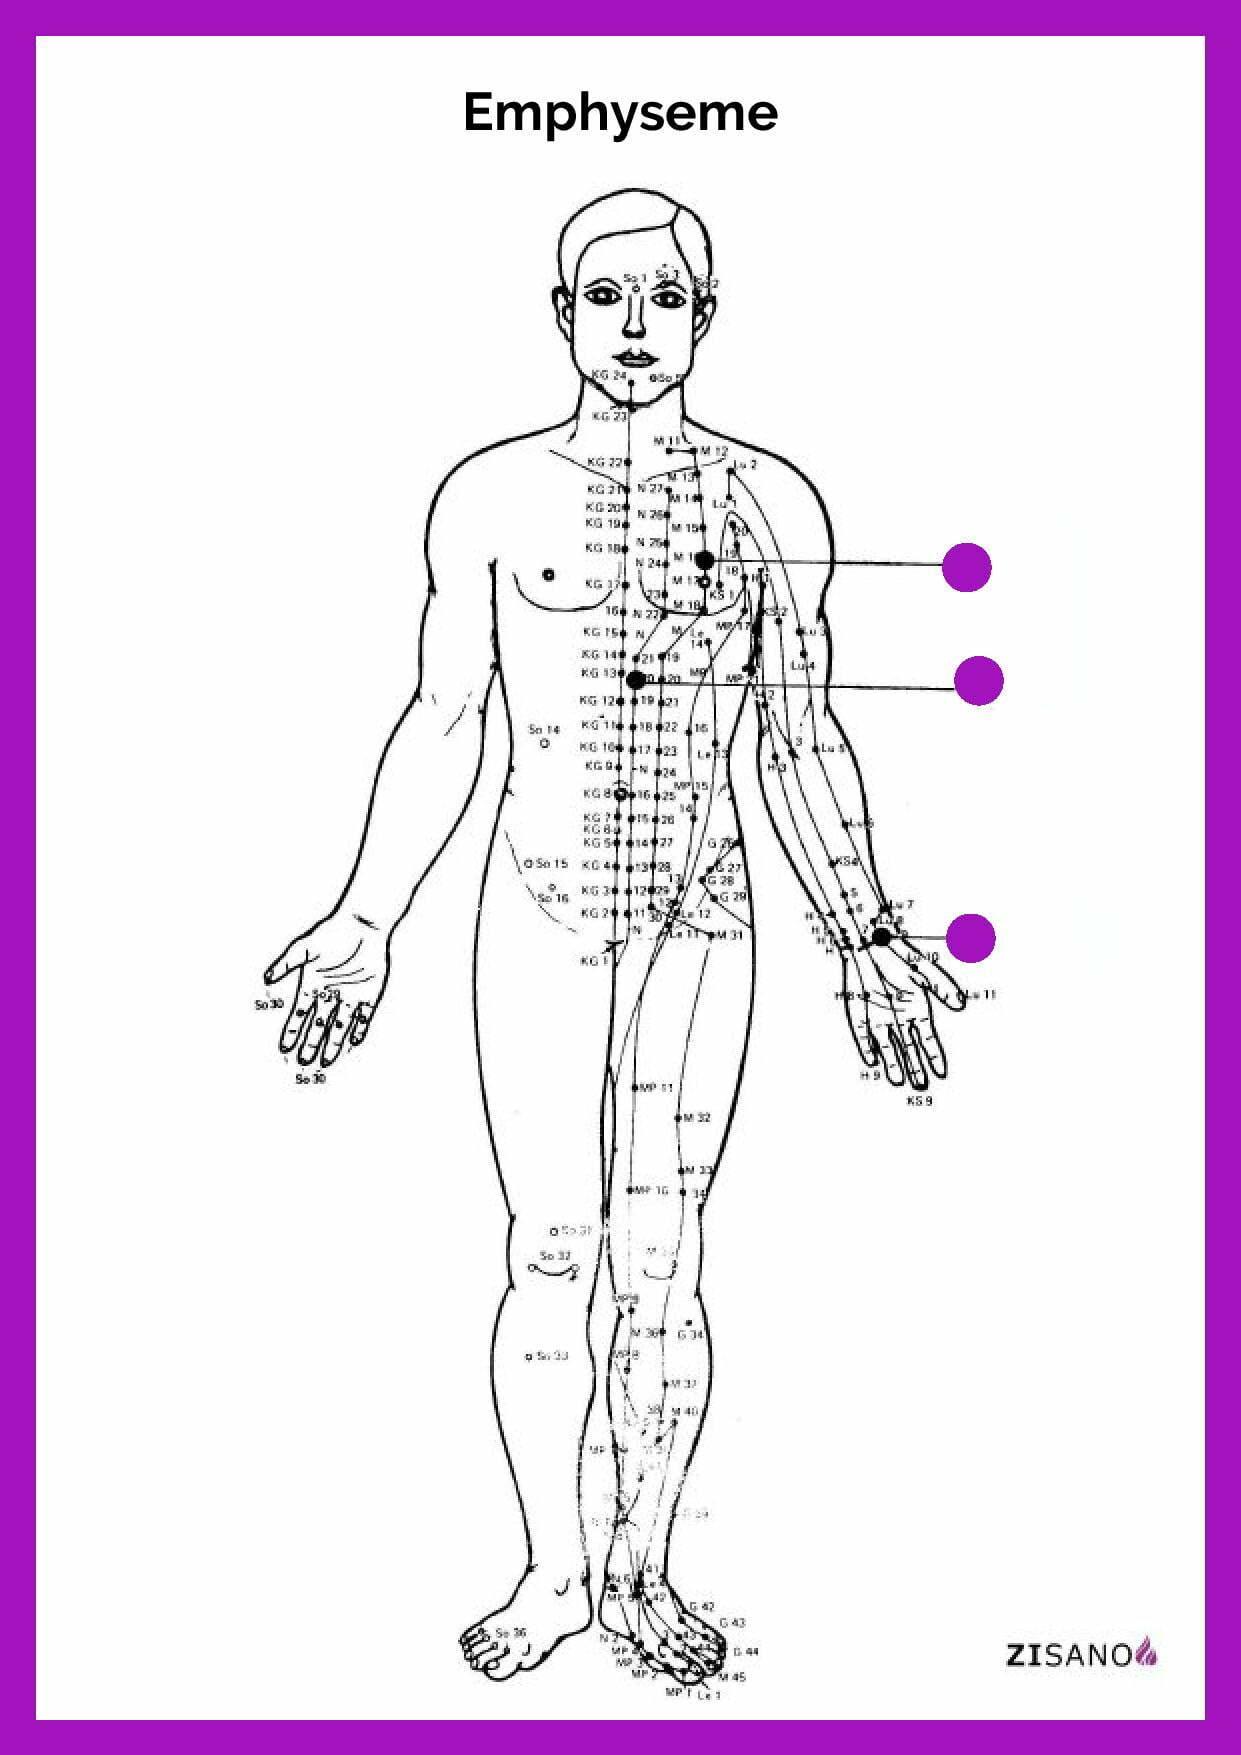 Meridiane - Emphyseme - Behandlung